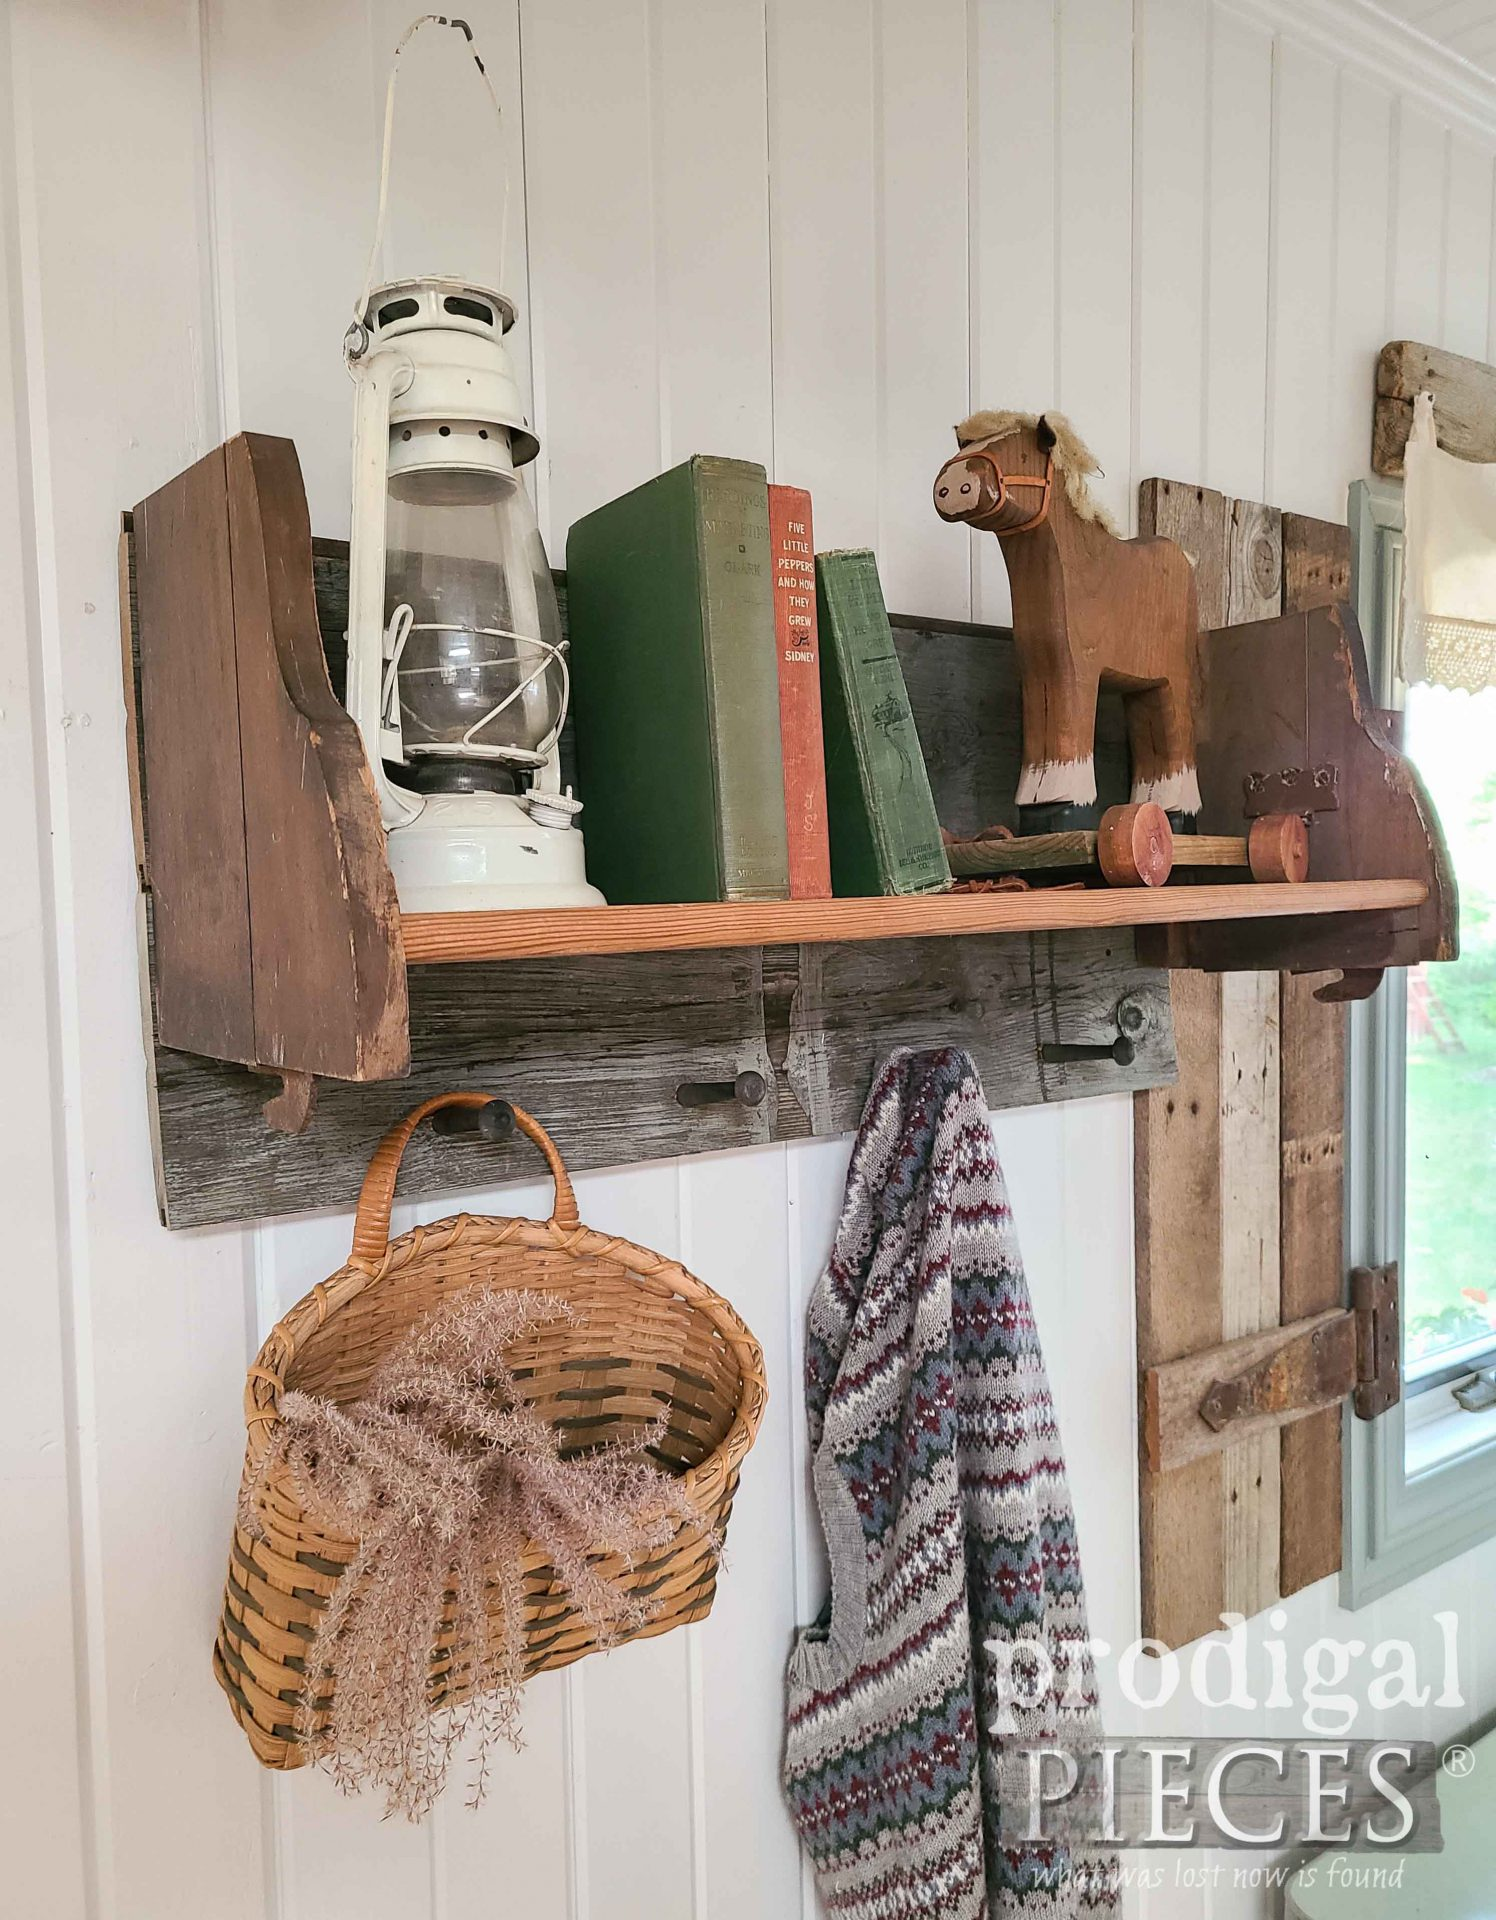 Rustic Reclaimed Shaker Peg Shelf Rack by Larissa of Prodigal Pieces   prodigalpieces.com #prodigalpieces #reclaimed #farmhouse #home #diy #rustic